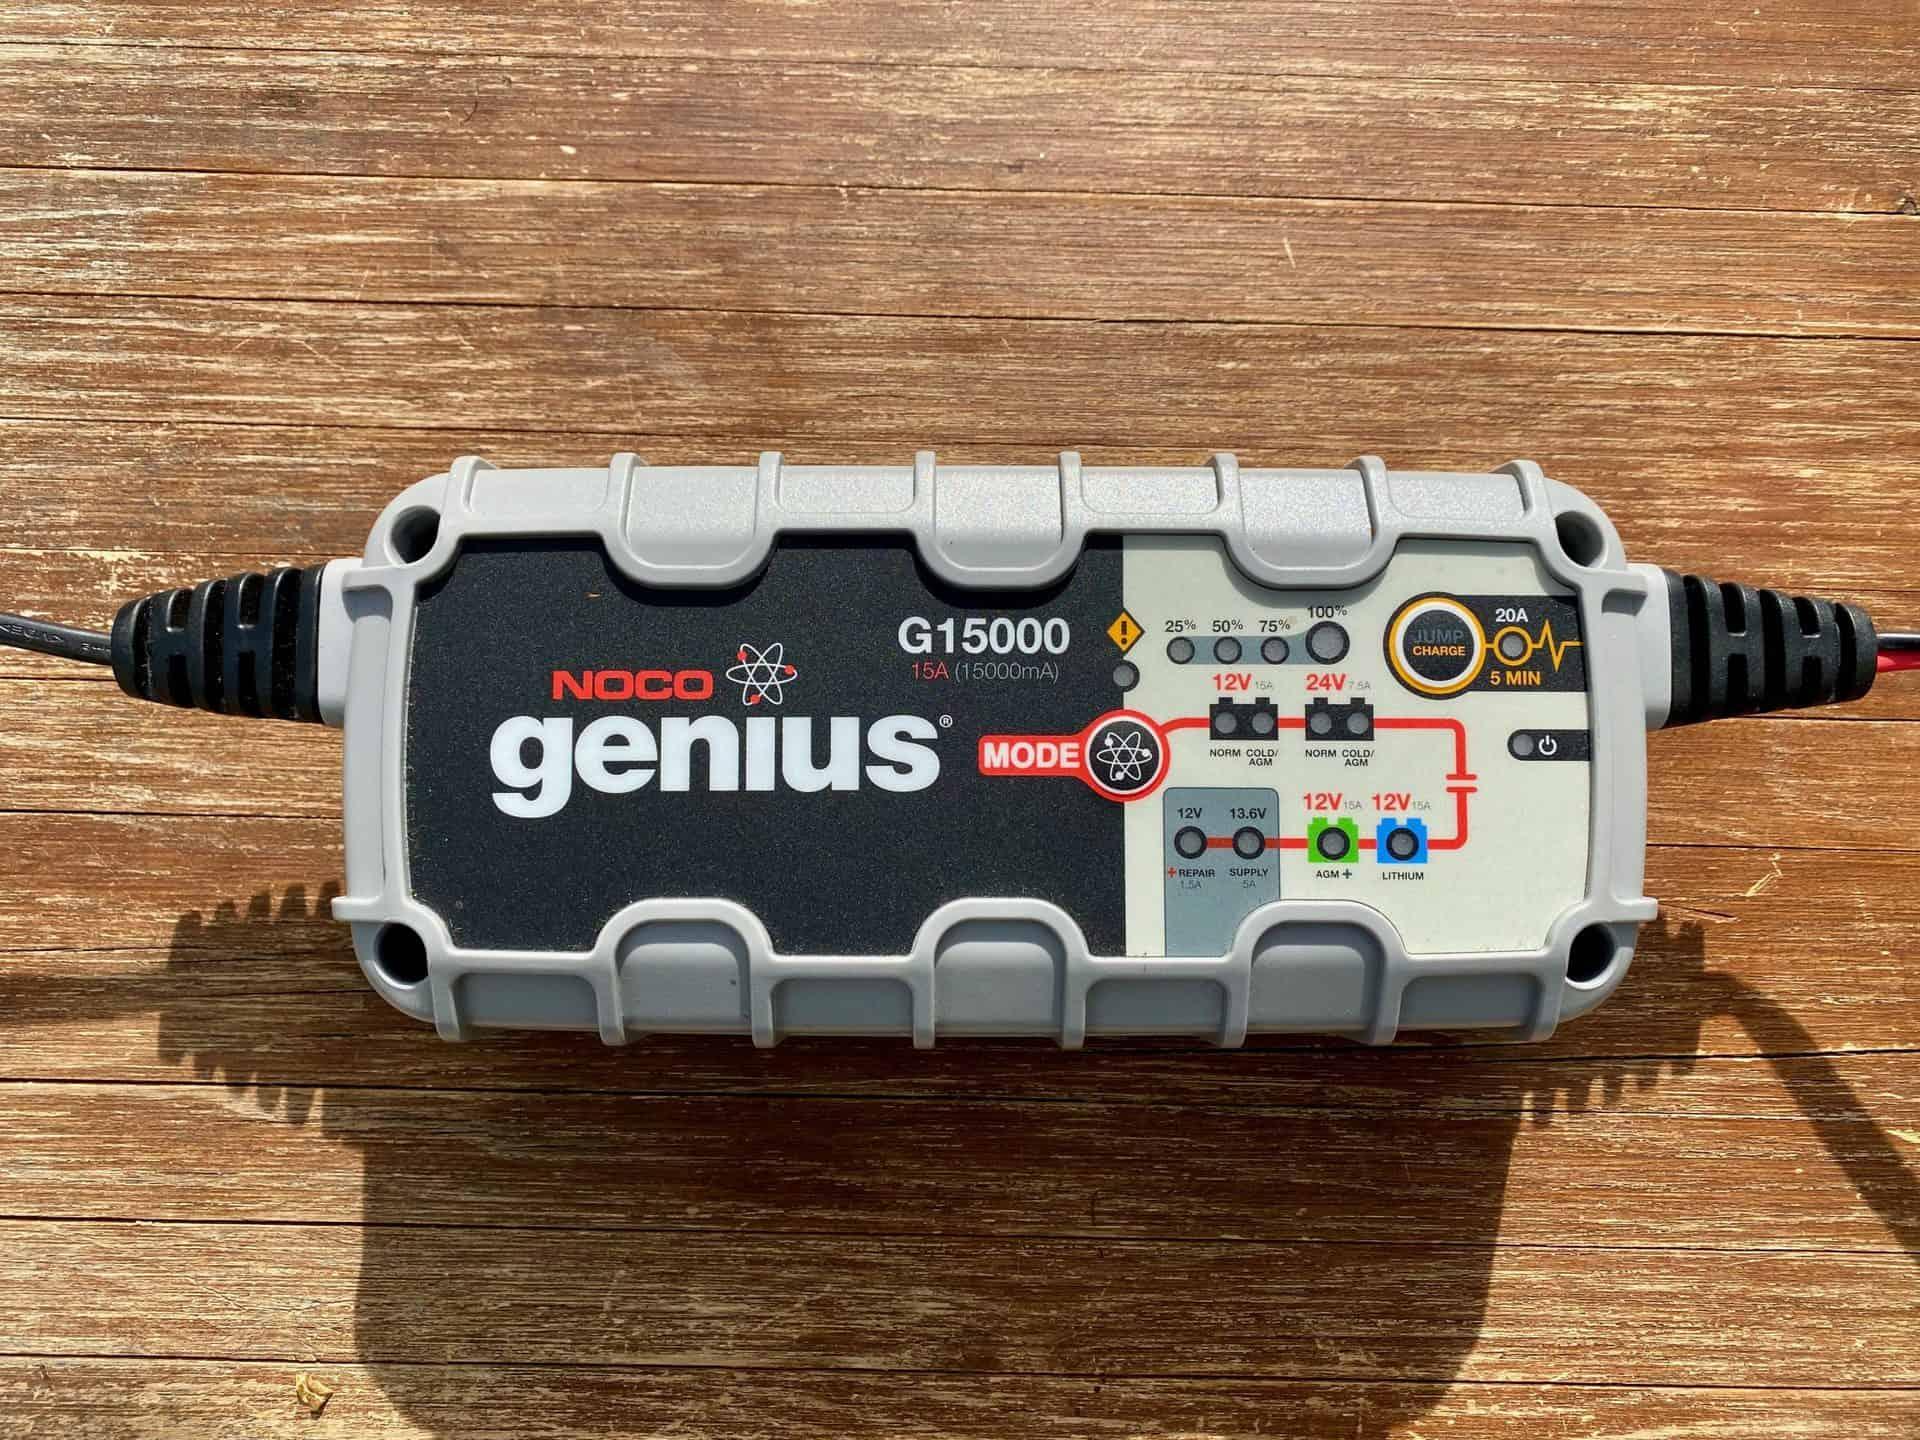 Noco-Genius-G15000-2